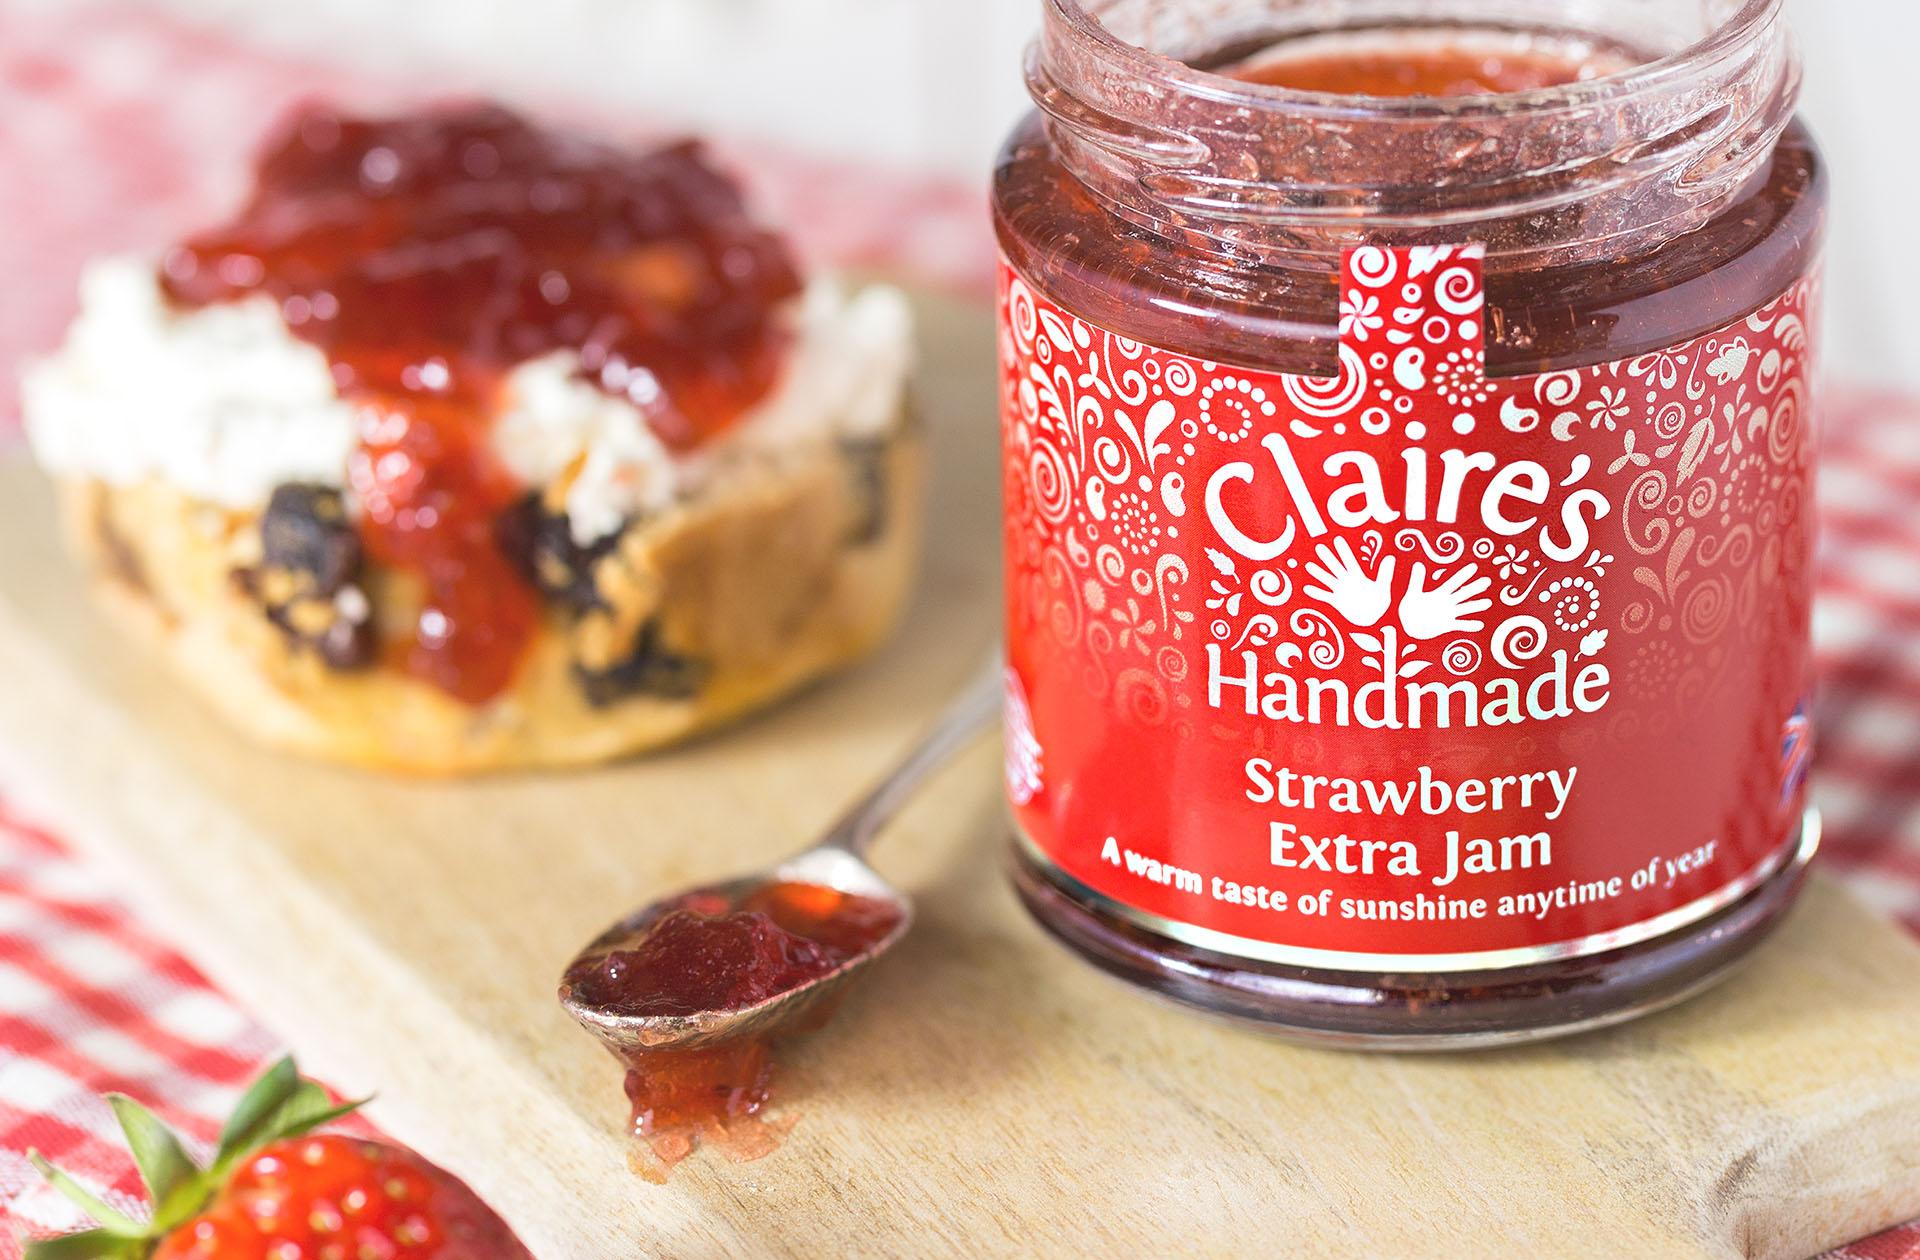 Scone with Strawberry Extra Jam